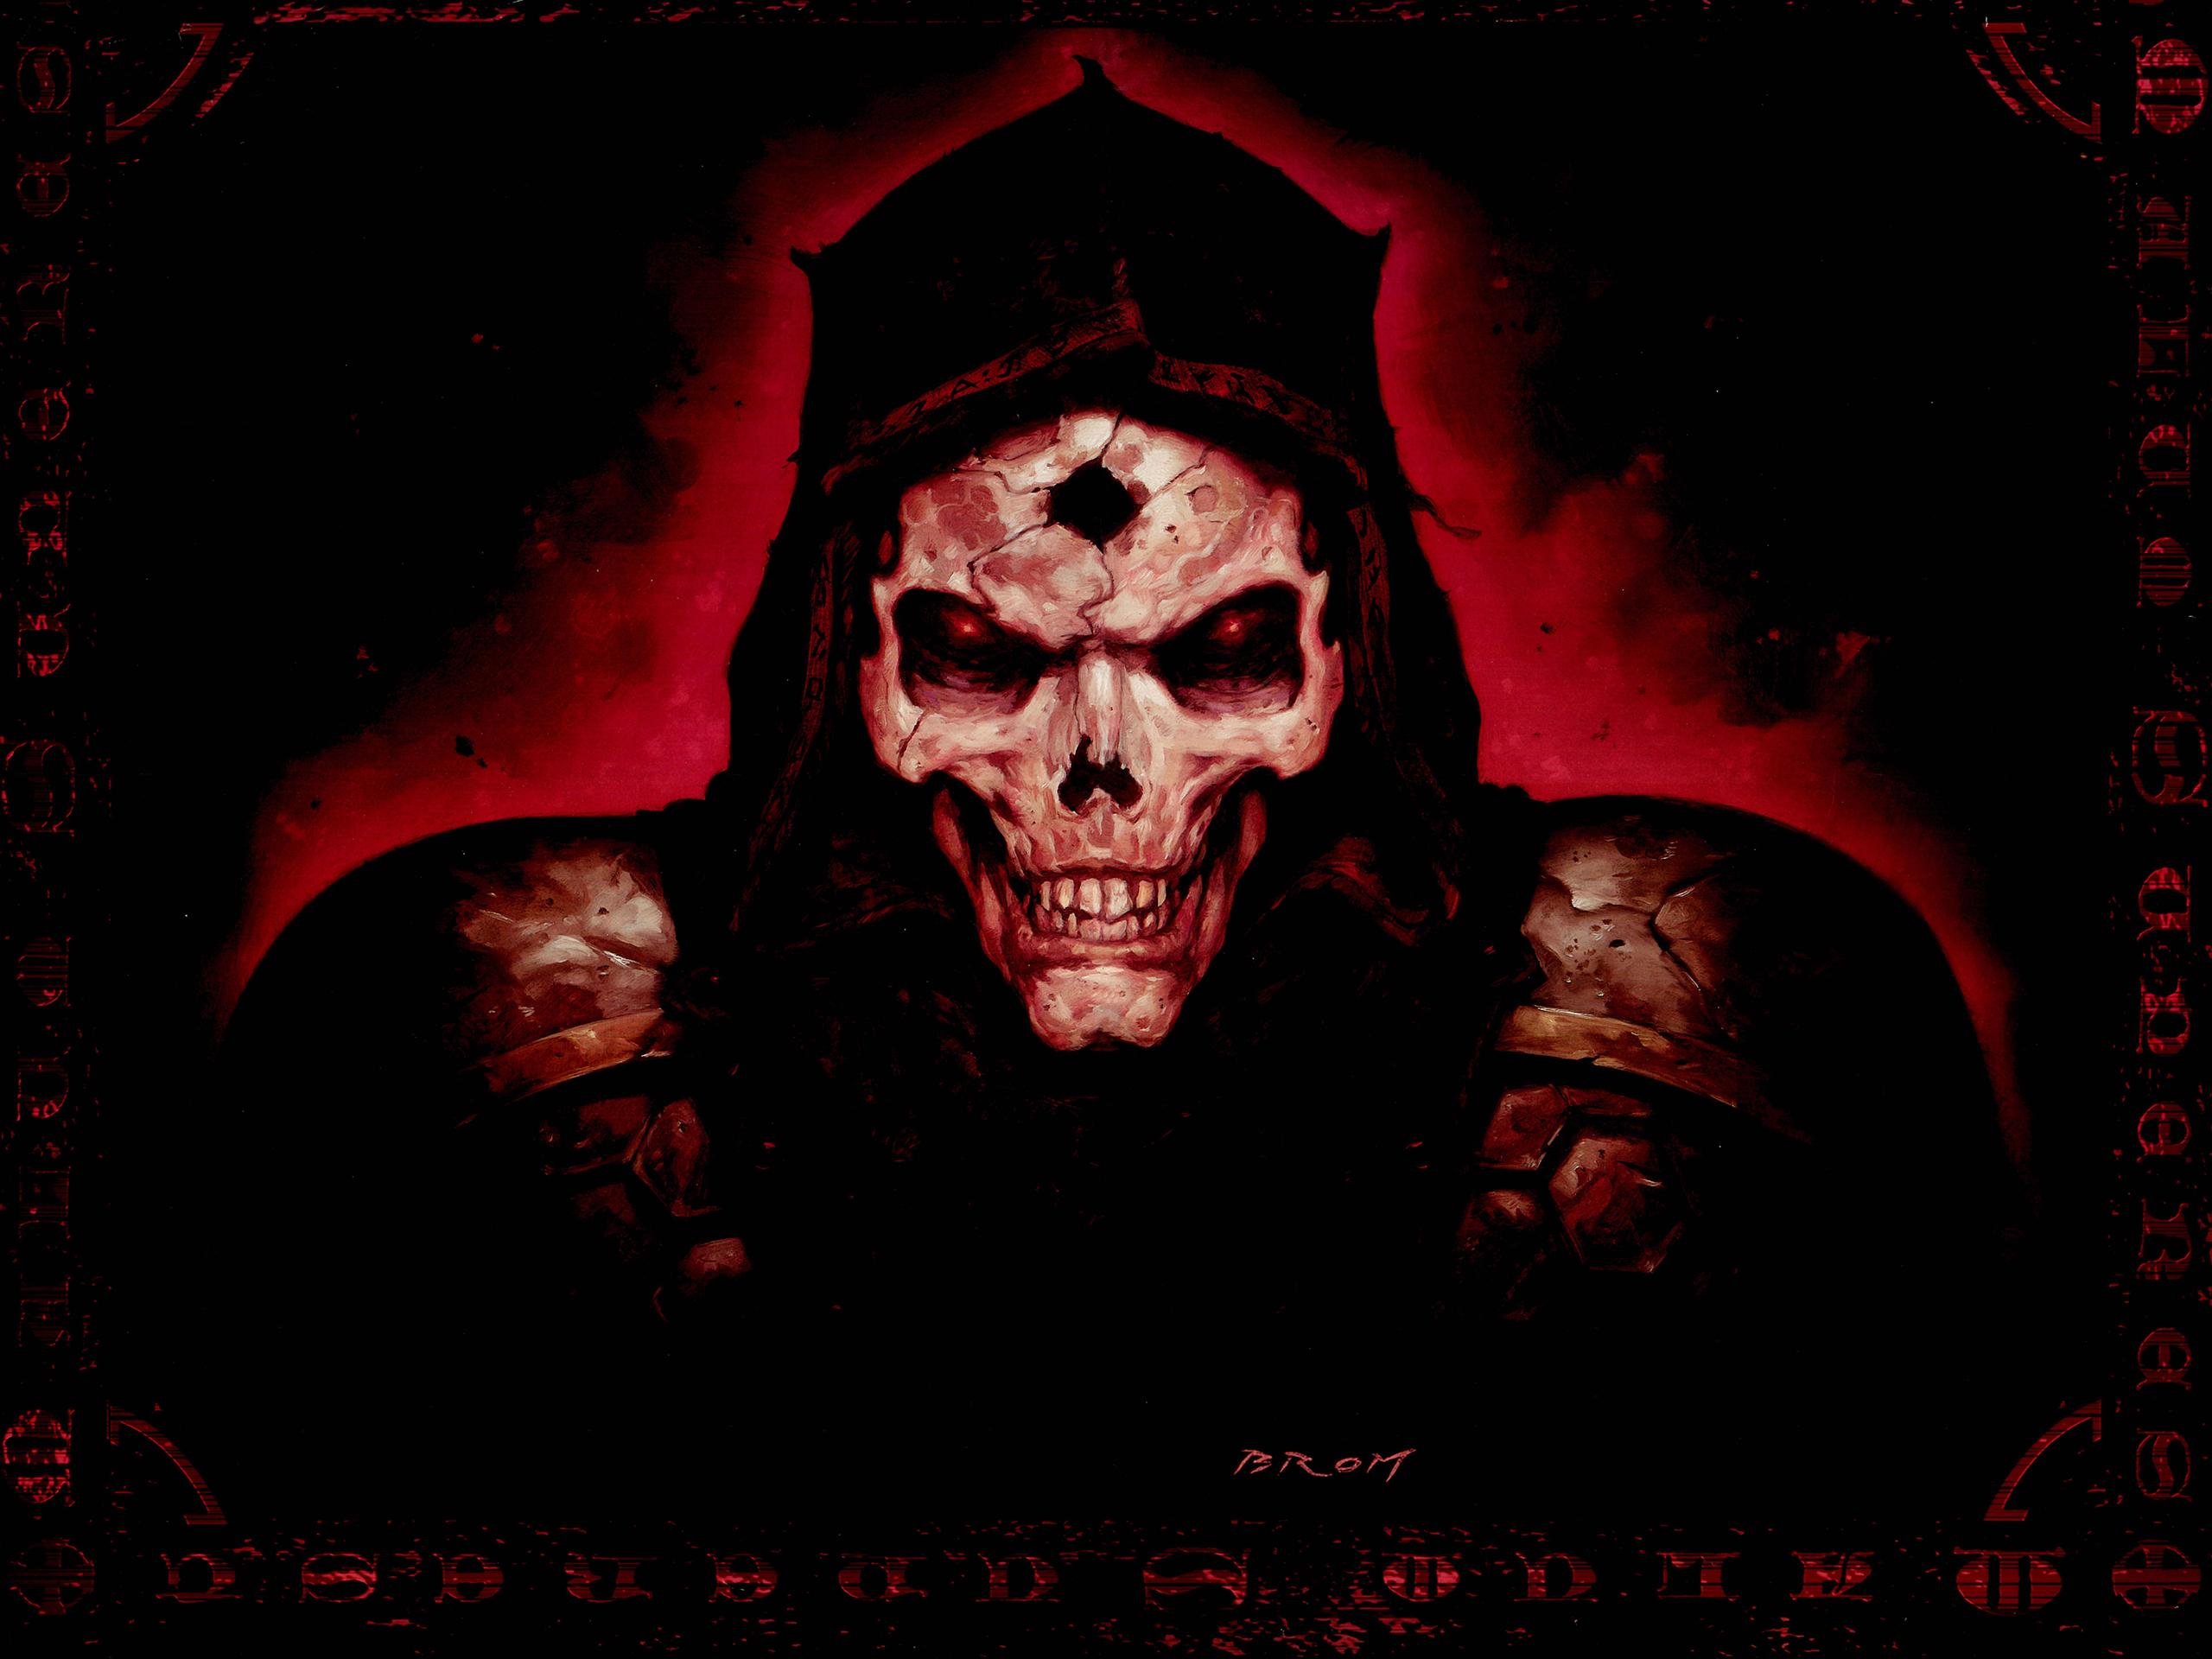 Horror skull evil scary spooky creepy face eyes wallpaper background